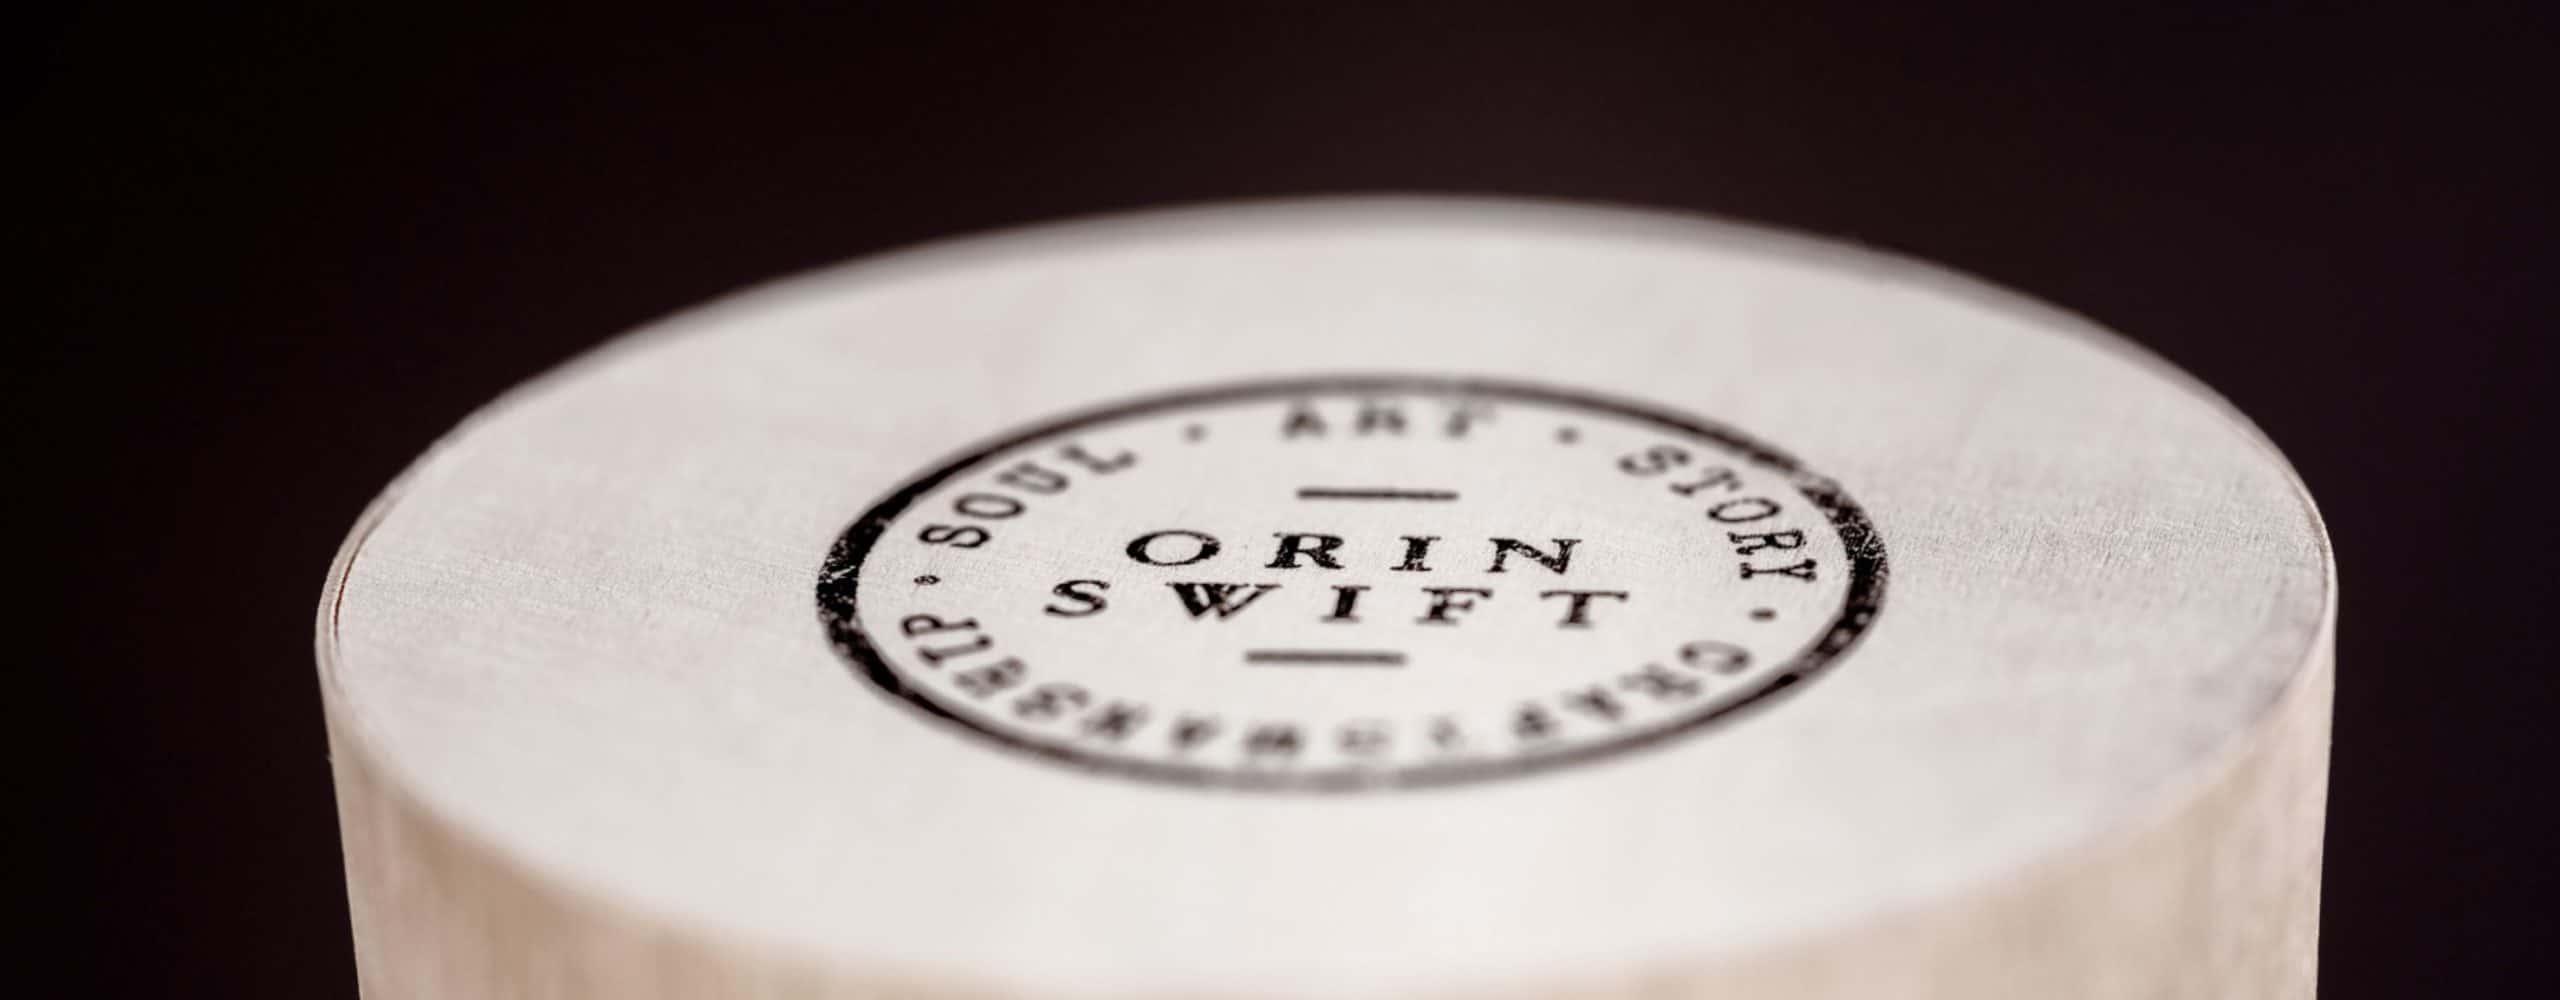 Mailing Orin Swift